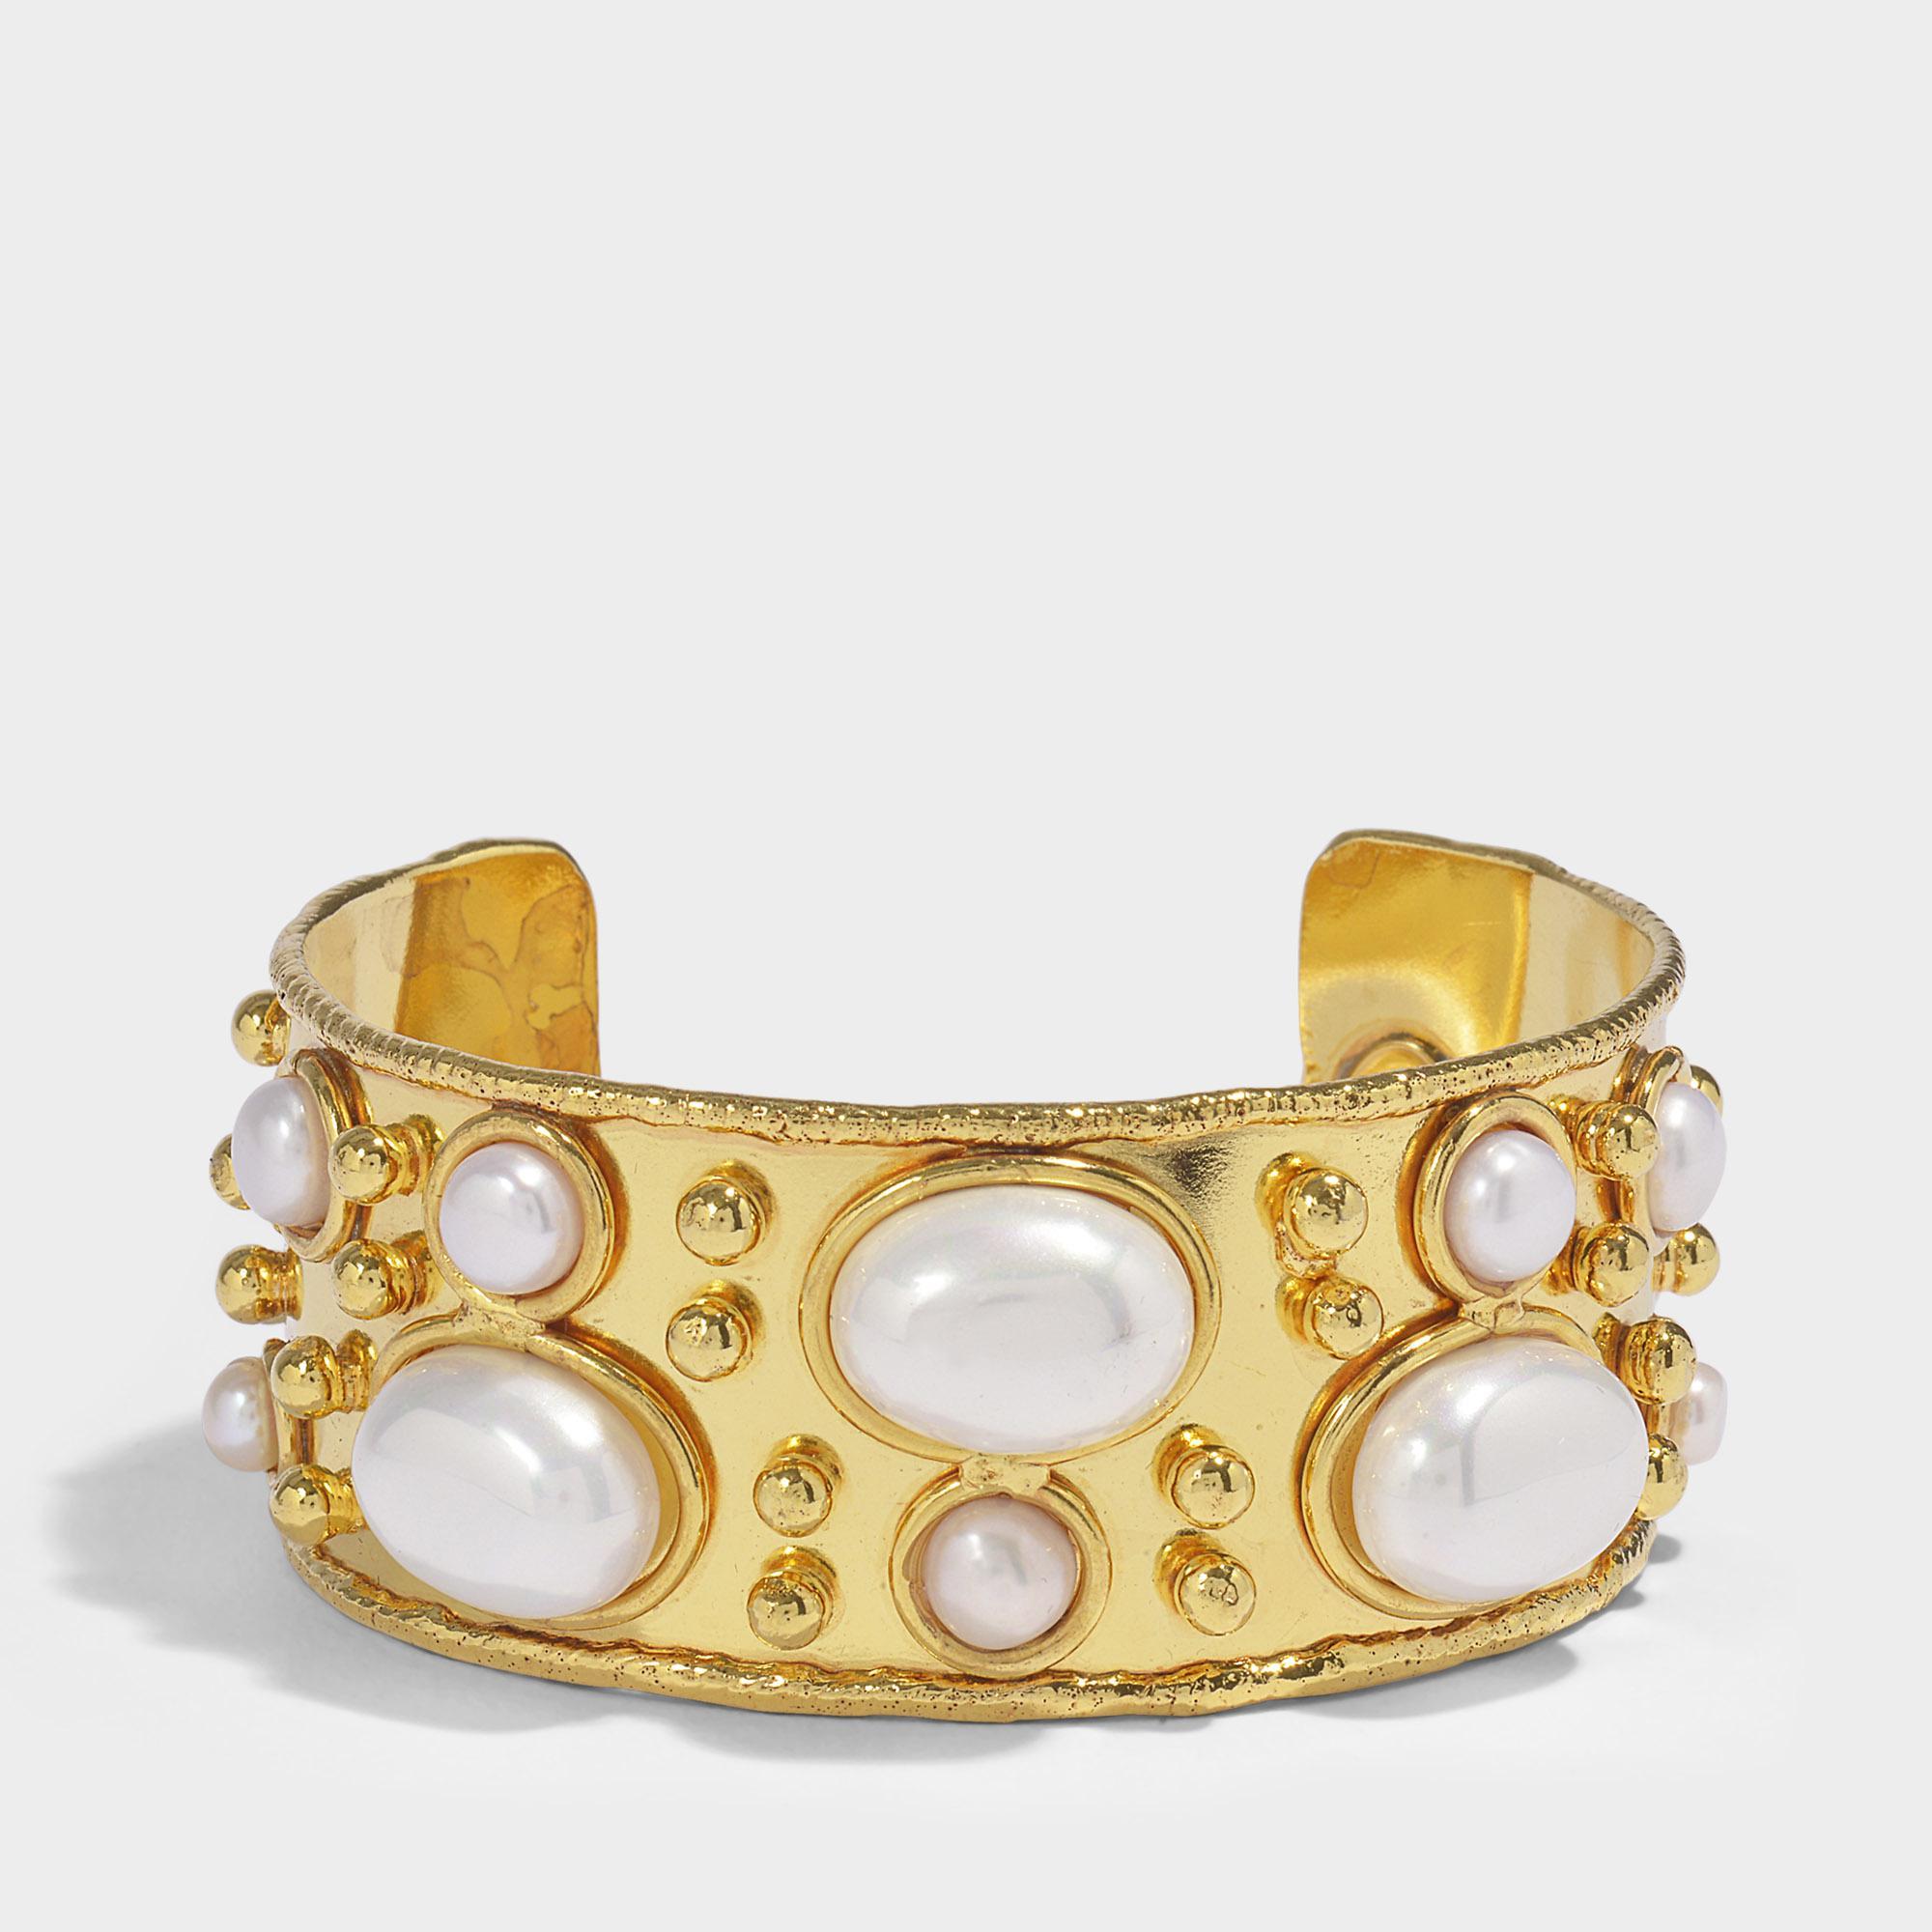 Sylvia Toledano Byzantine Cuff Bracelet in Gold-Plated Brass with White Pearls vqxya2Vjdr